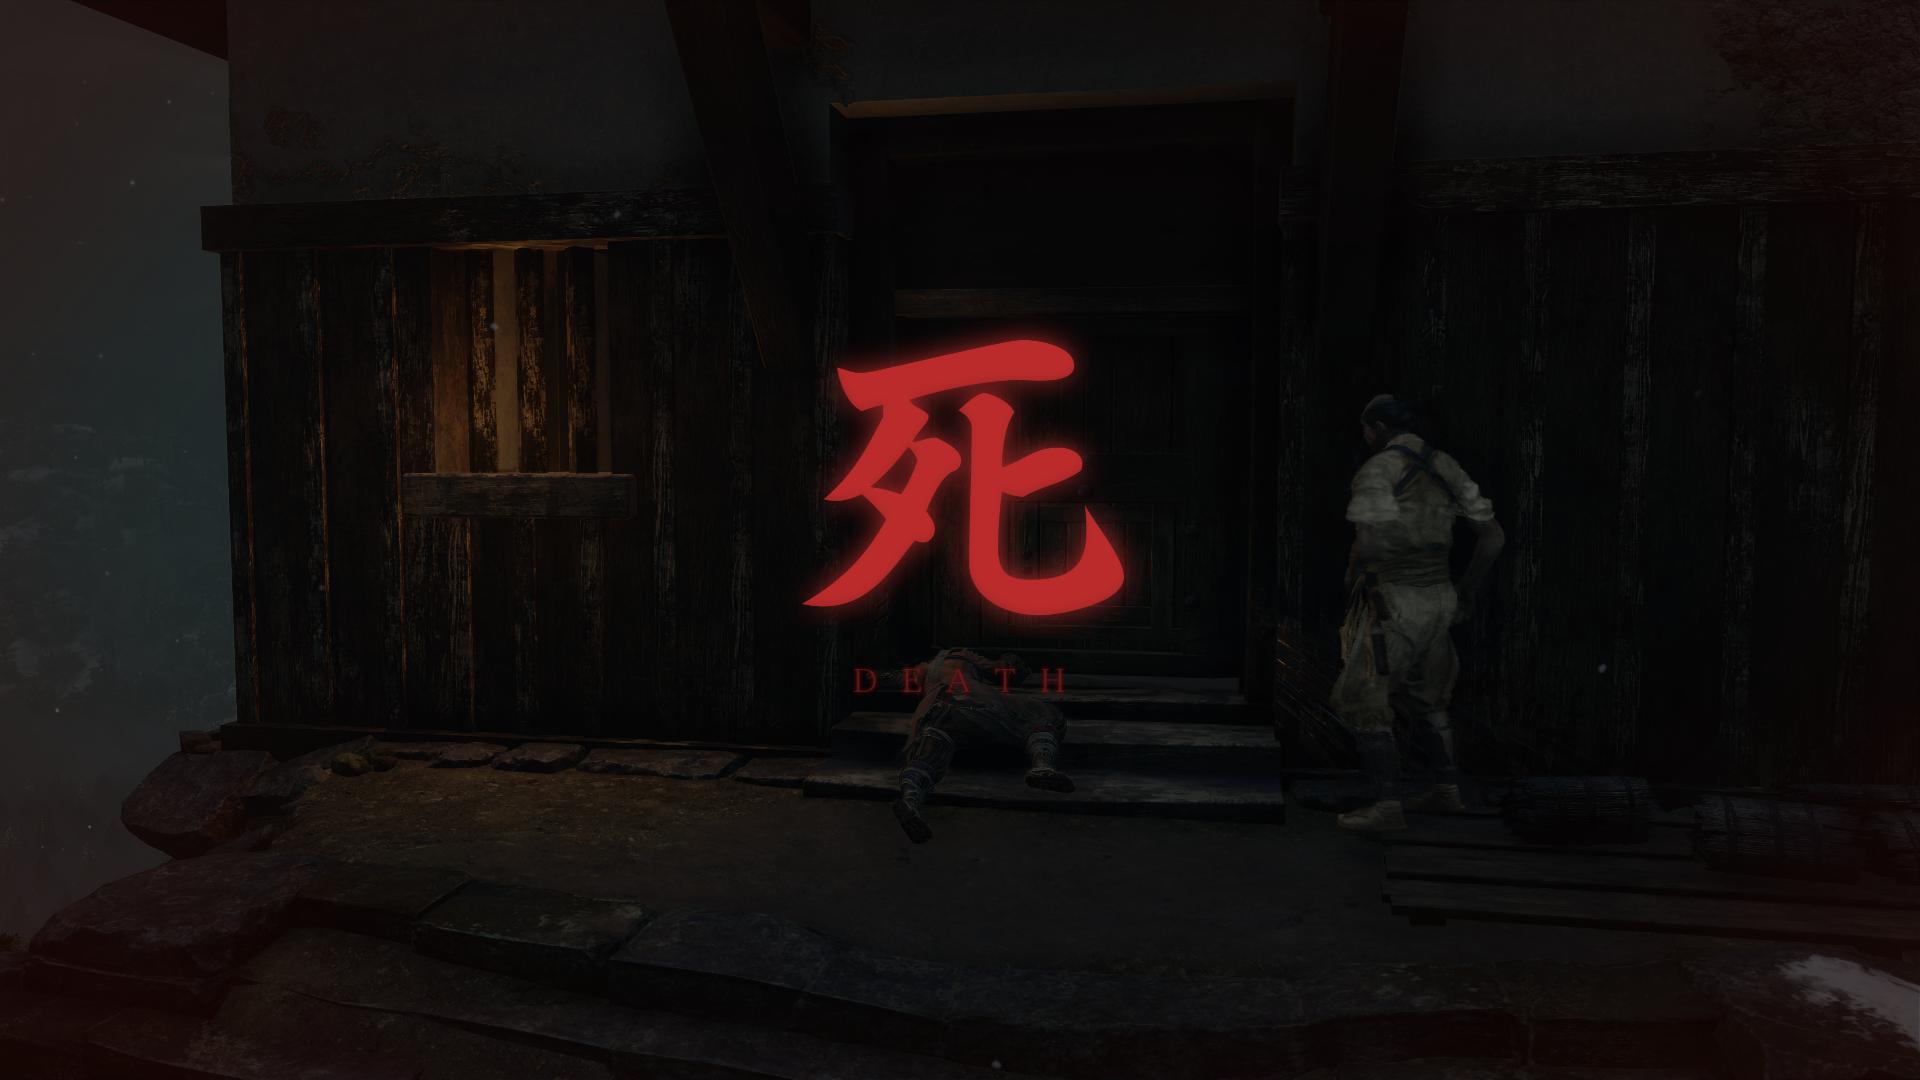 Death screenshot of Sekiro: Shadows Die Twice video game interface.